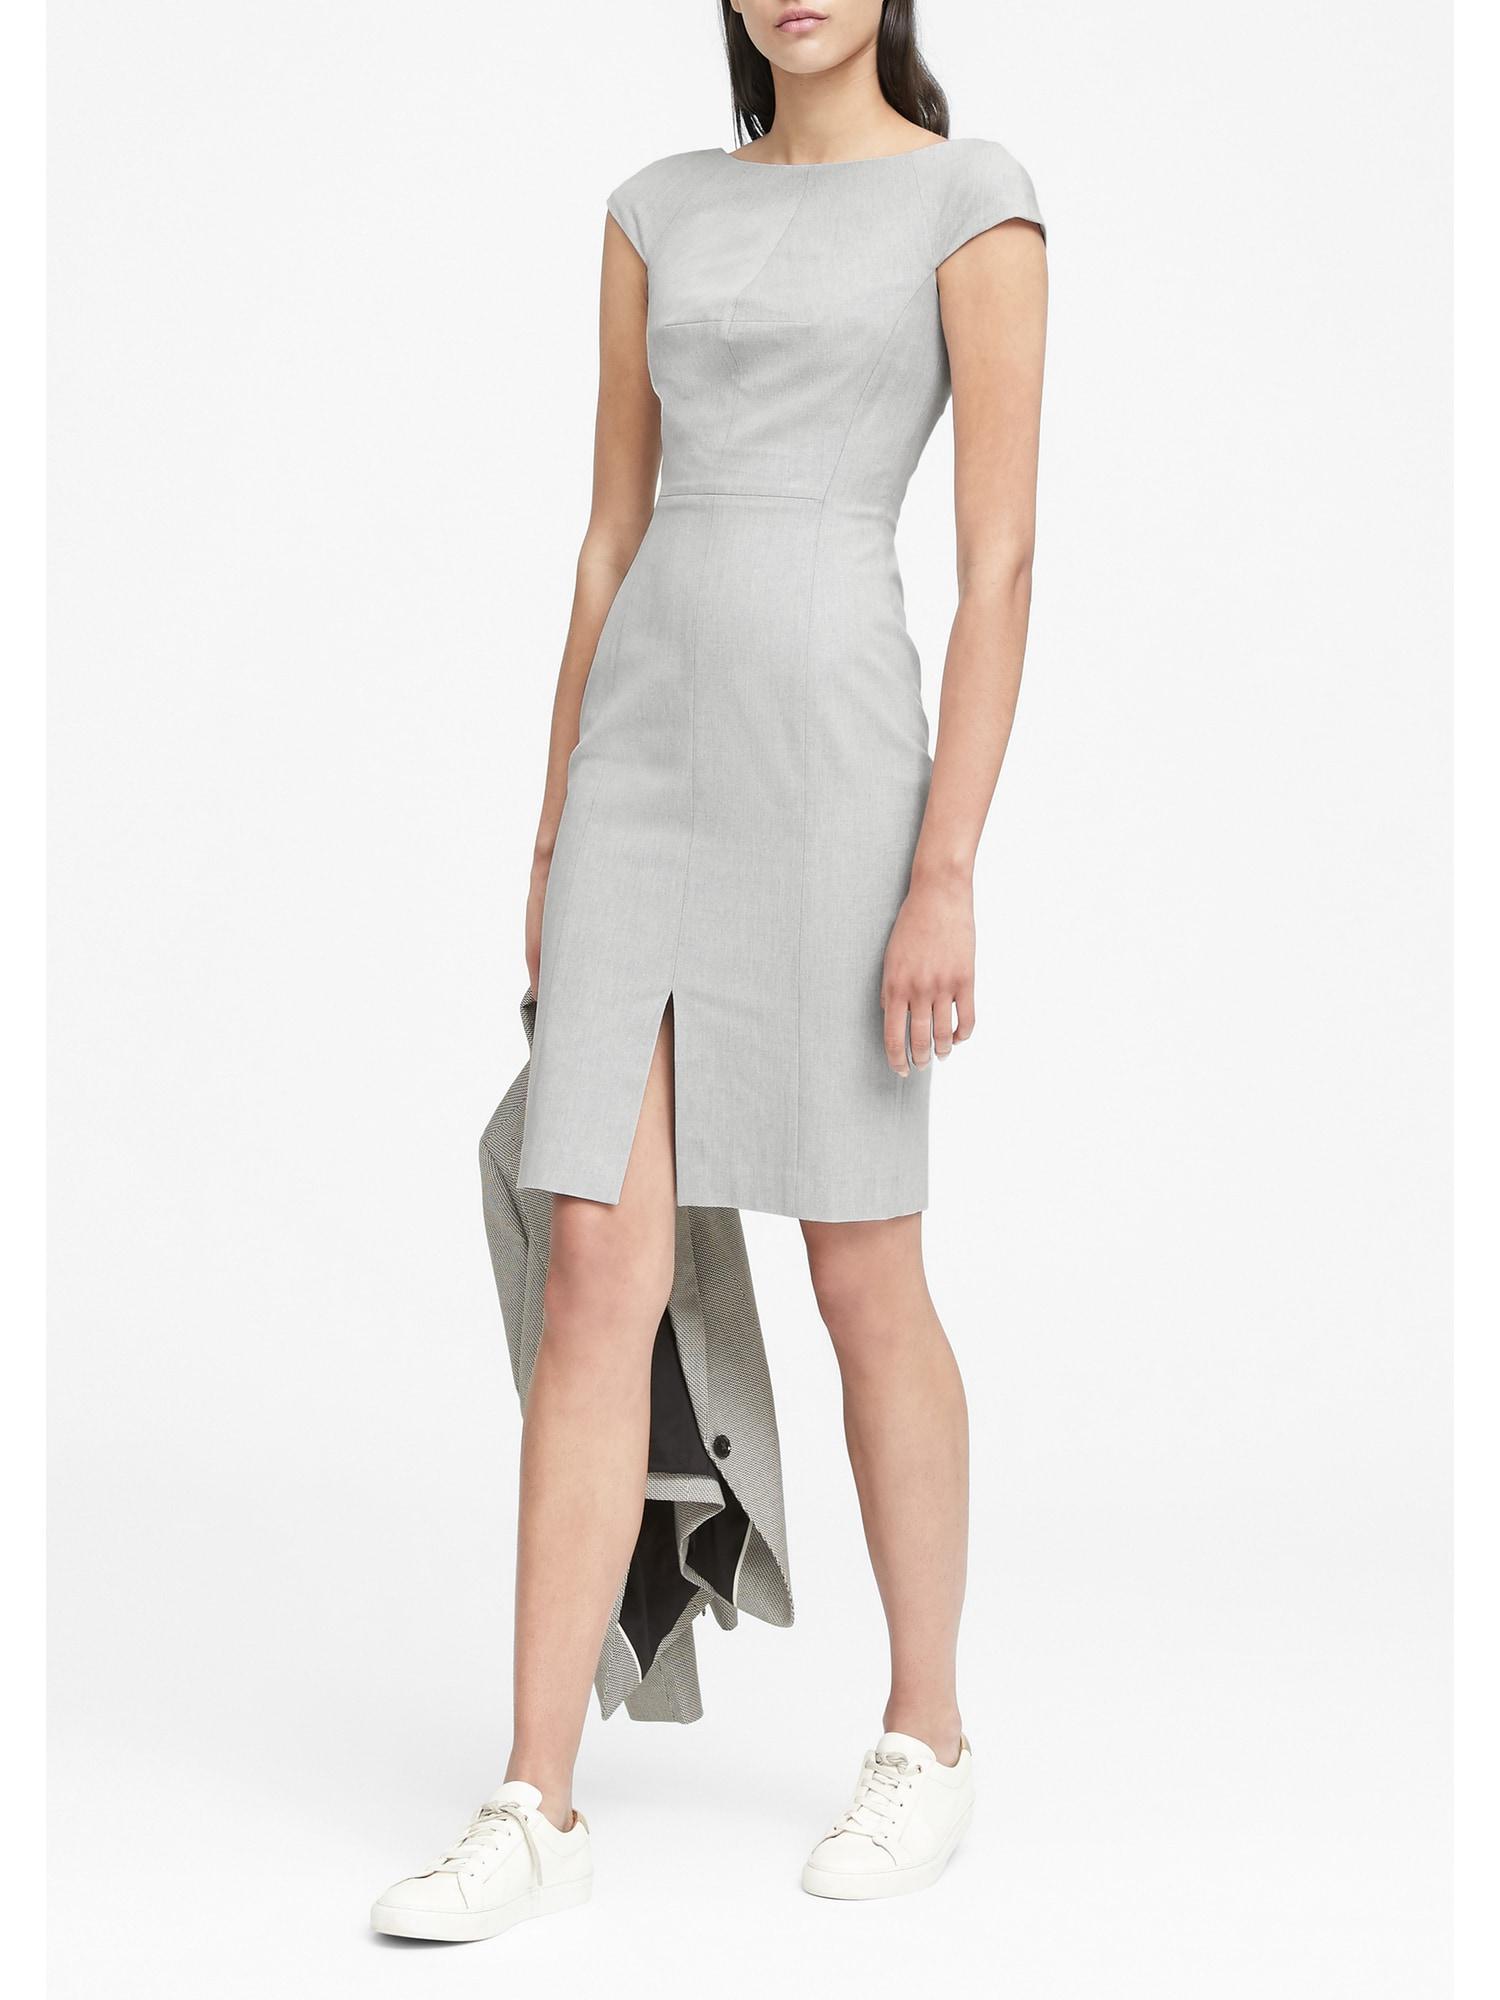 106d53d3d321 Lyst - Banana Republic Heathered Bi-stretch V-back Sheath Dress in Gray